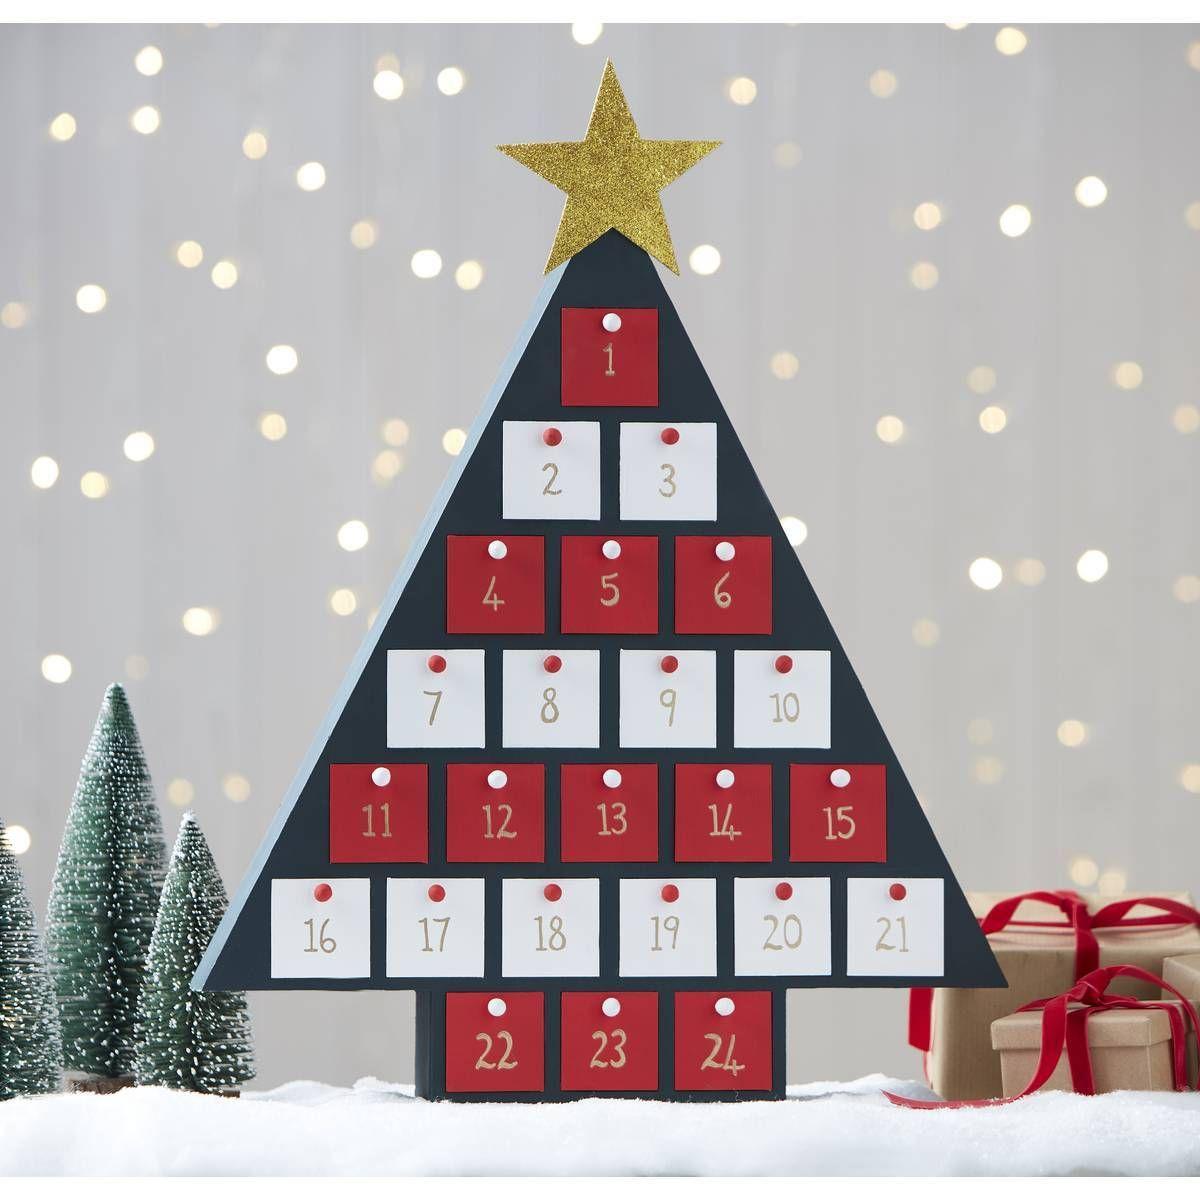 Wooden Christmas Tree Advent Calendar Hobbycraft Christmas Tree Advent Calendar Christmas Tree Advent Calendar Diy Wood Advent Calendar